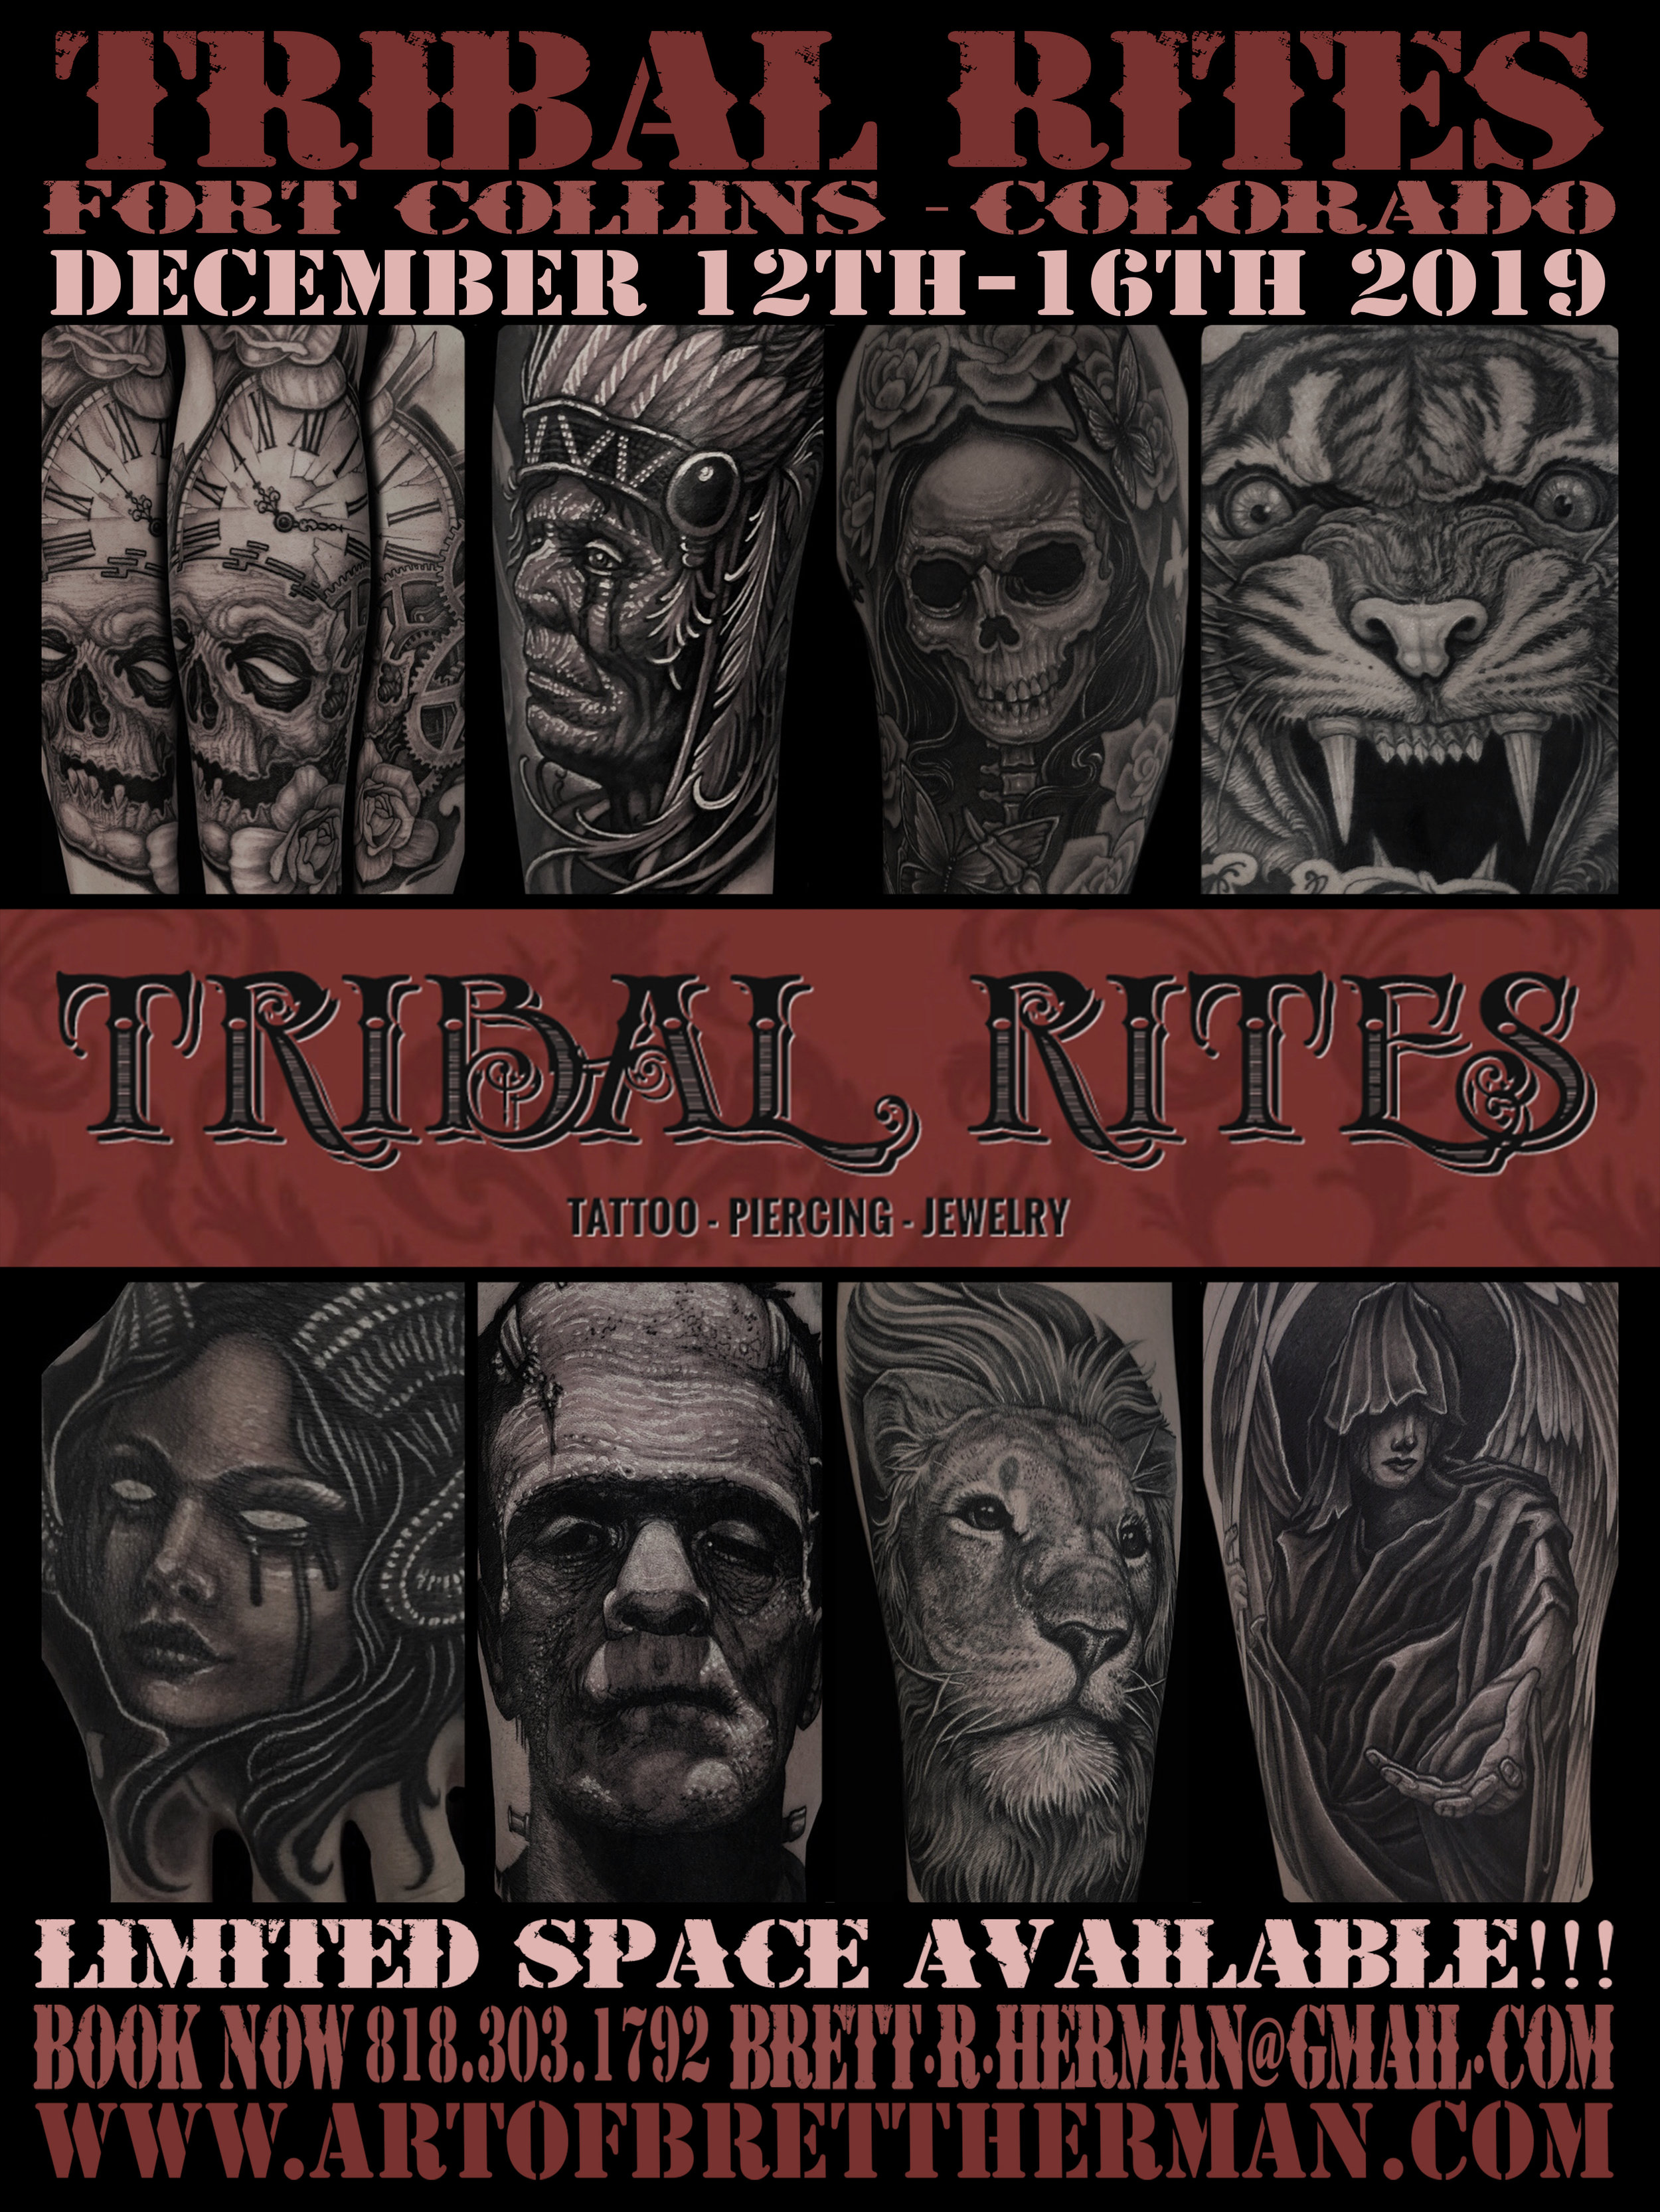 Colorado & Los Angeles based Tattoo & fine artist | Art of Brett Herman